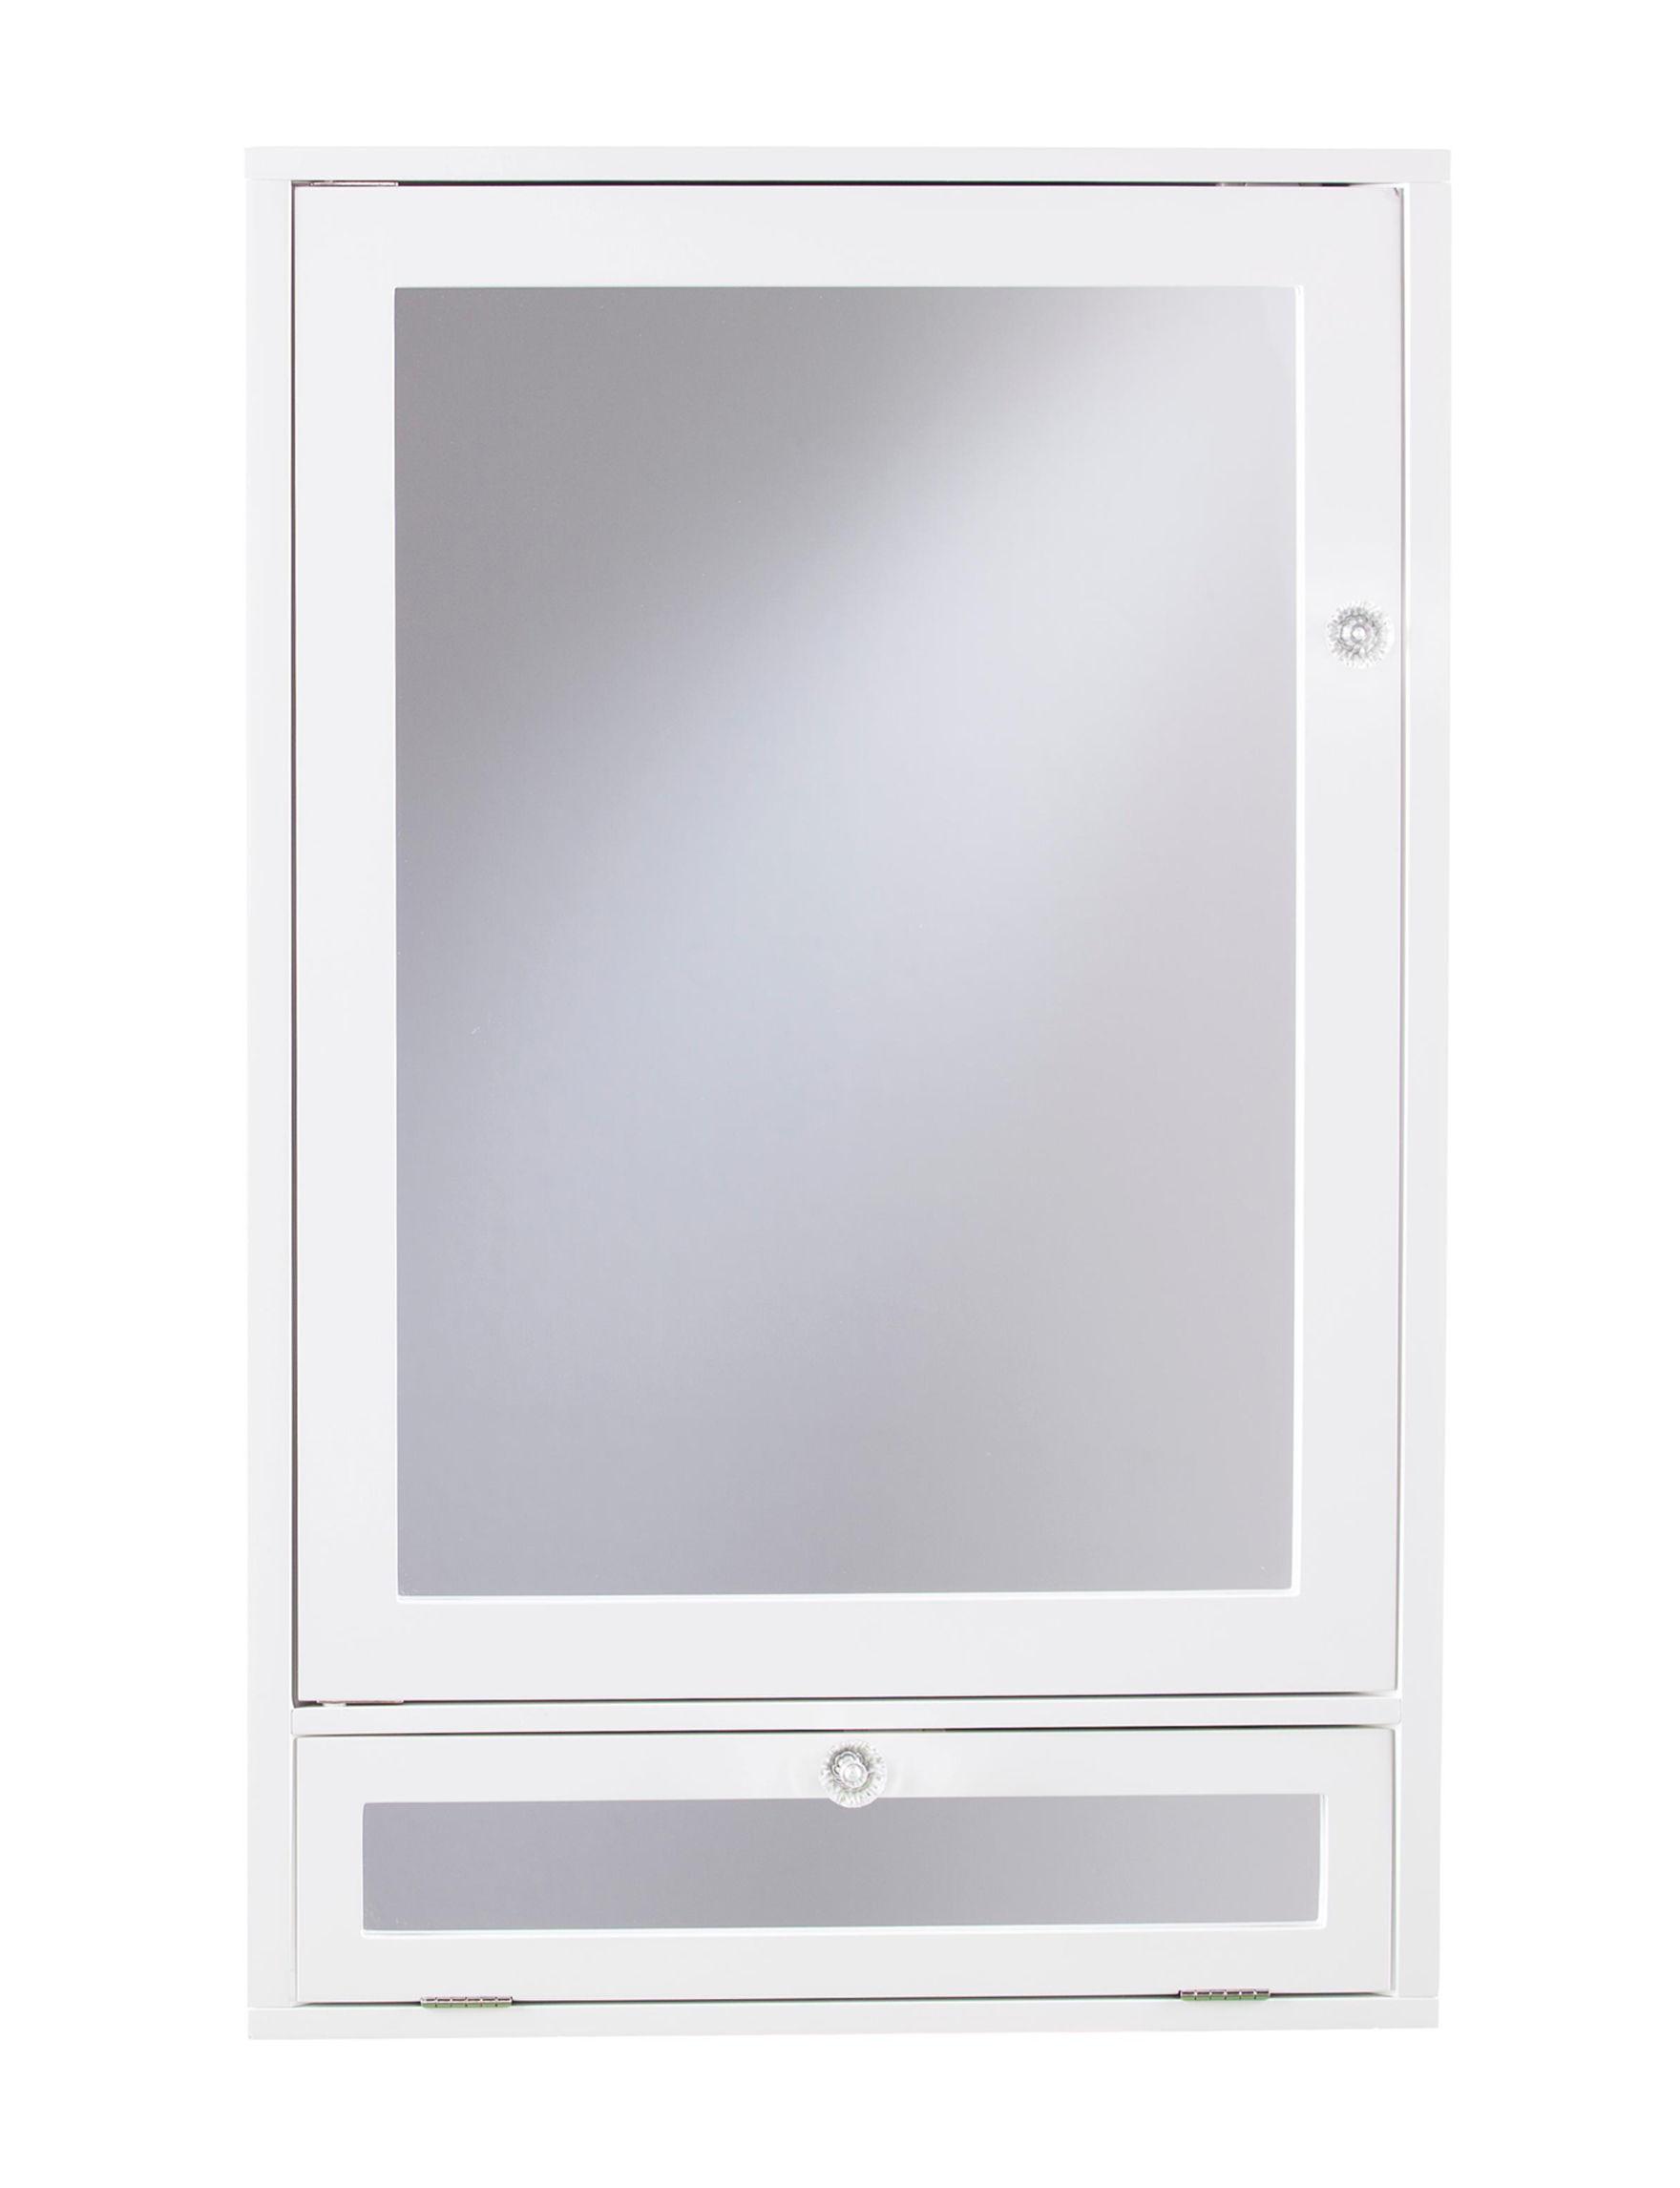 Southern Enterprises  Accent Shelves & Wall Hooks Mirrors Wall Art Storage & Organization Wall Decor